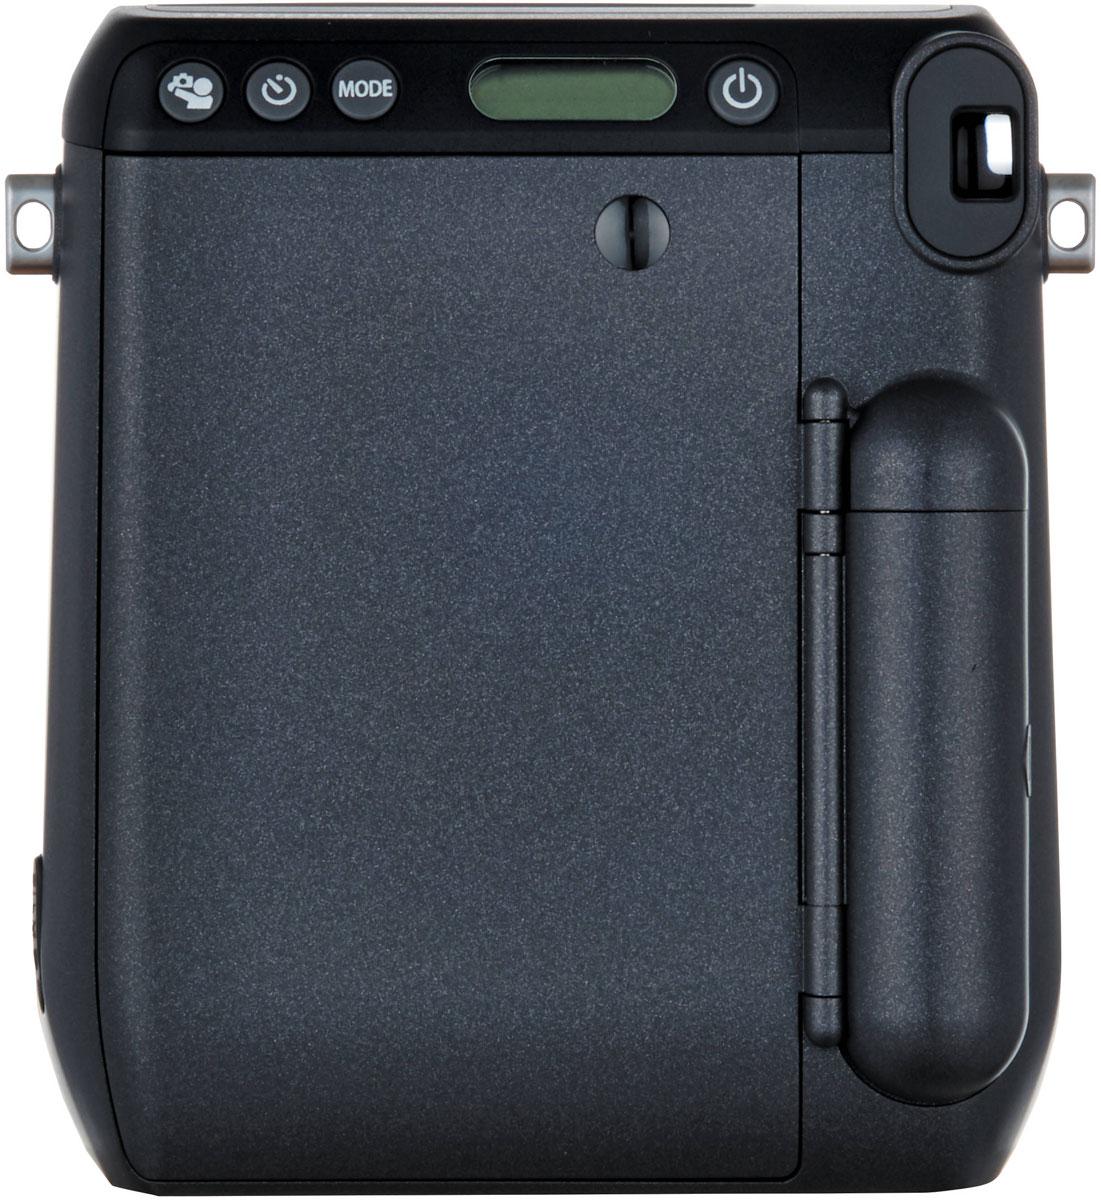 Fujifilm Instax Mini 70, Black фотокамера мгновенной печати